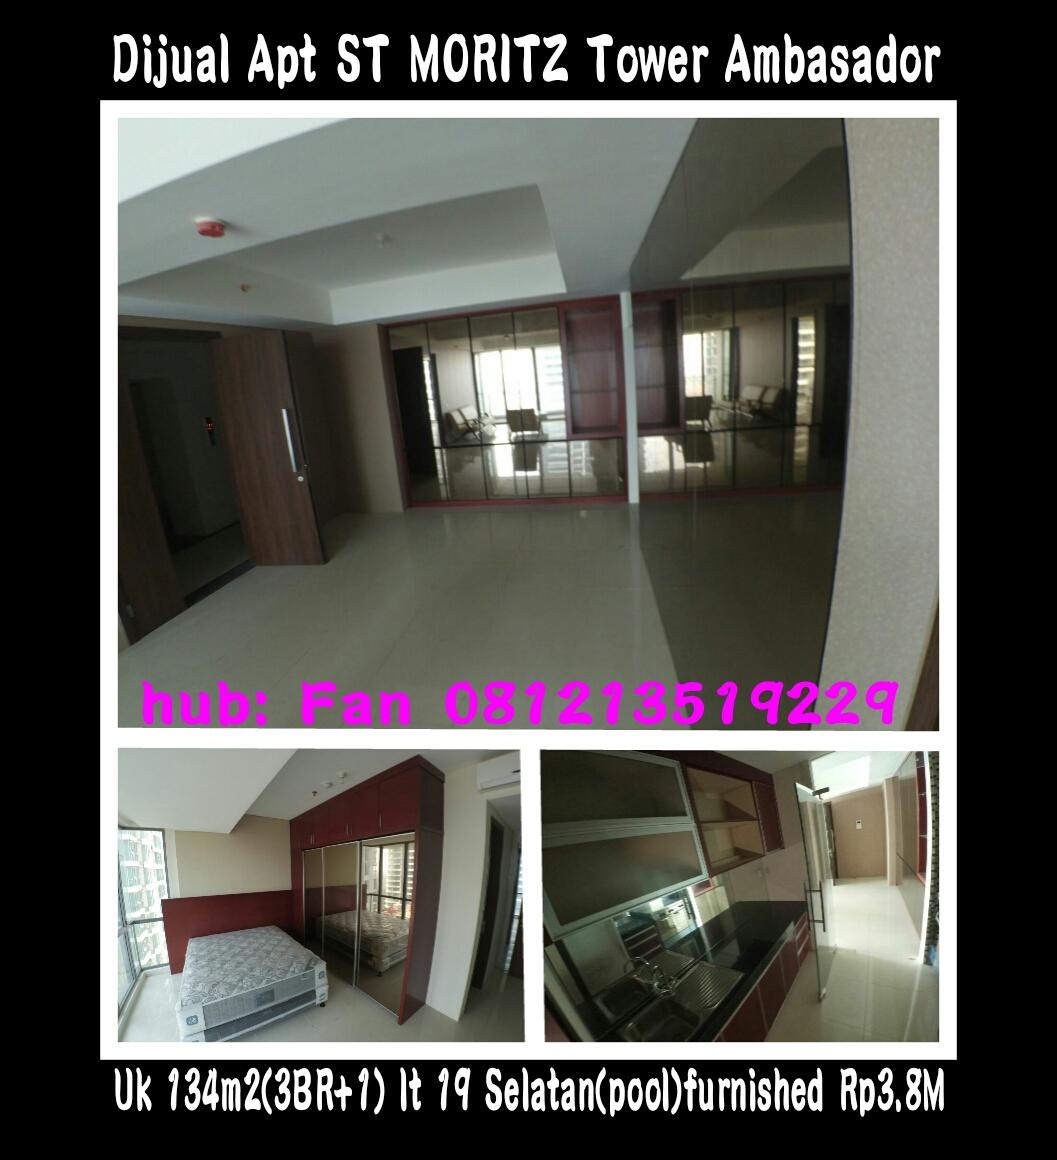 Apartment St Moritz Ambassador Tower 134m2